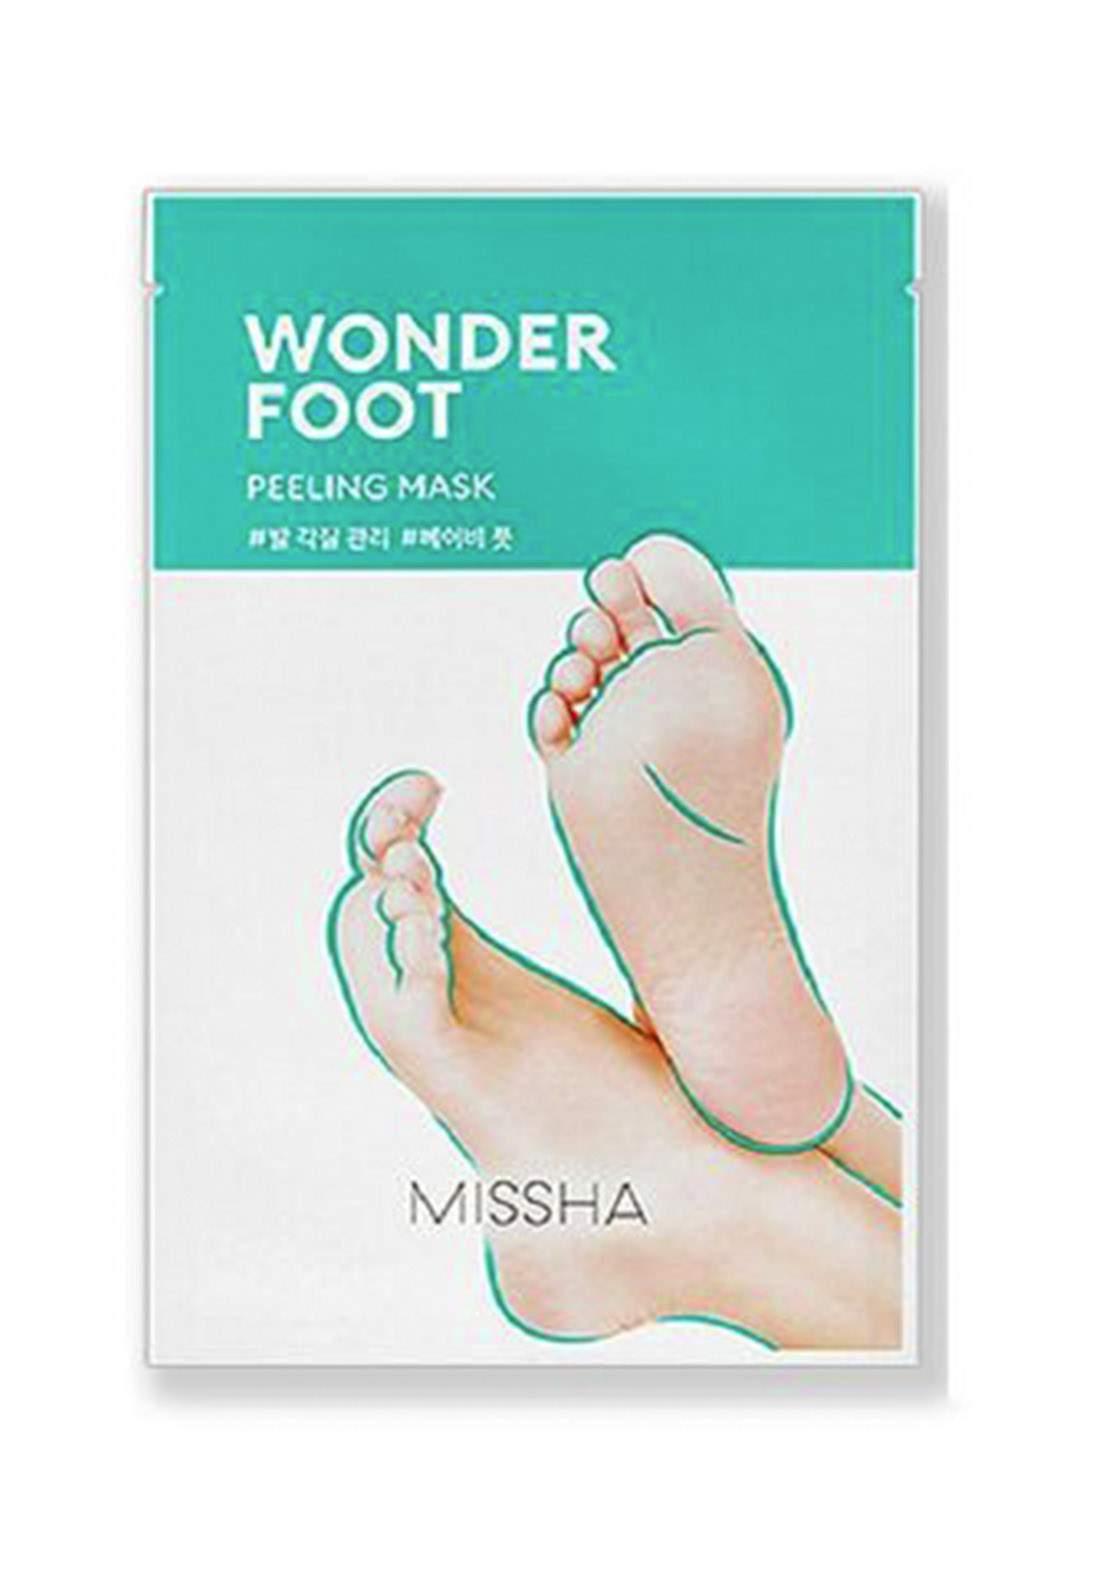 Missha Wonder Foot Peeling Mask 50ml ماسك مقشر للقدم